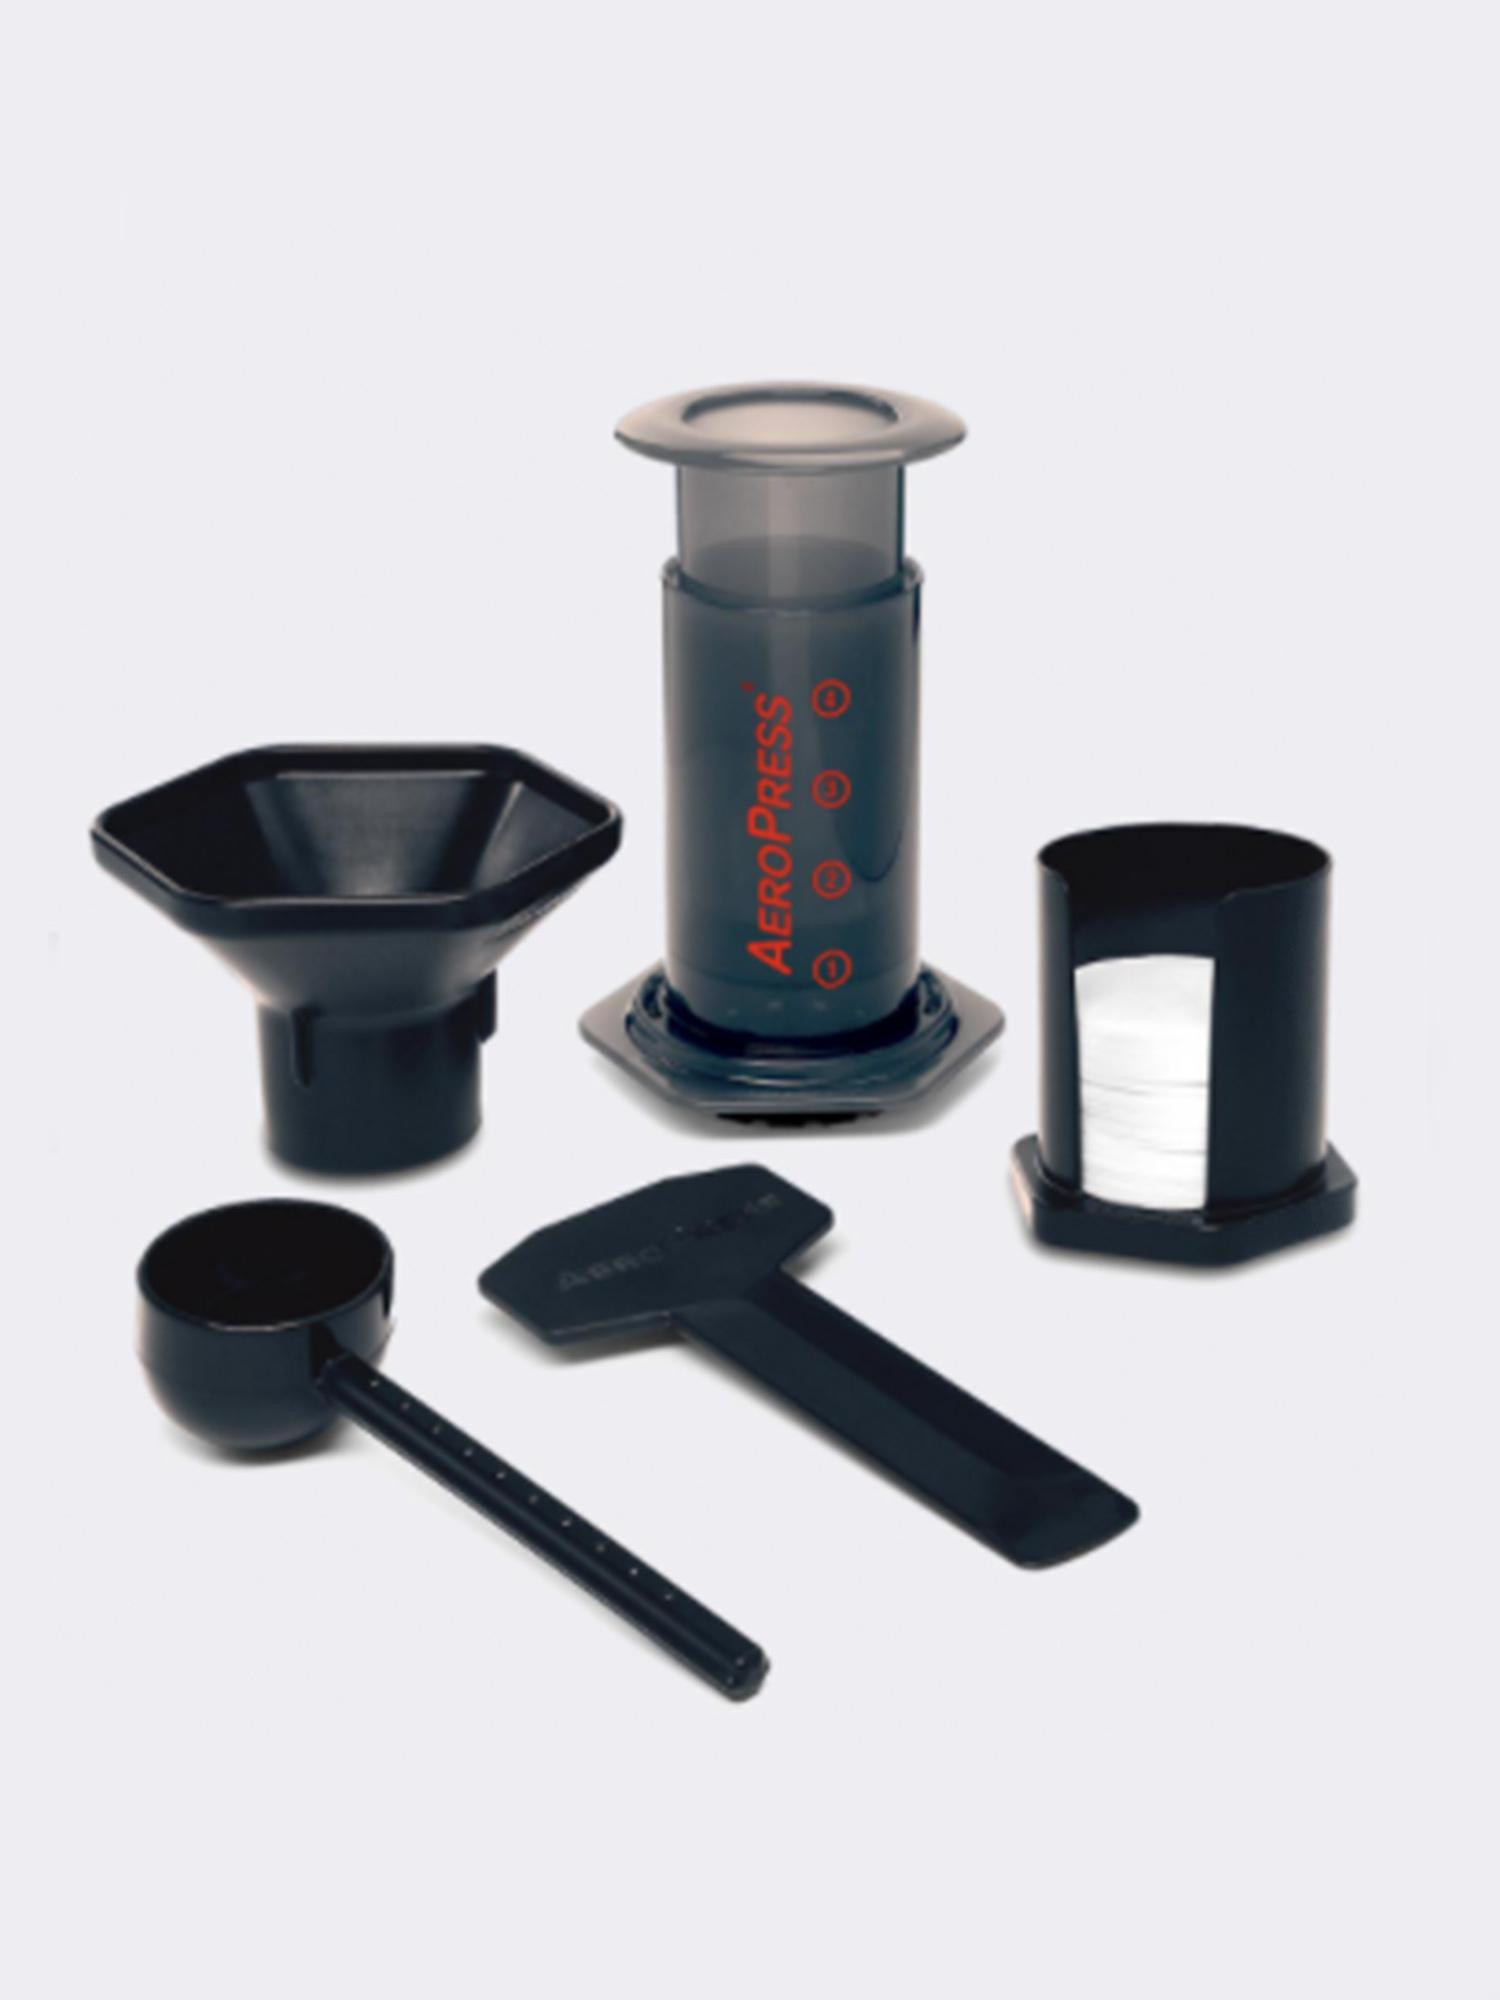 AeroPress Coffee Press Espresso Maker-1